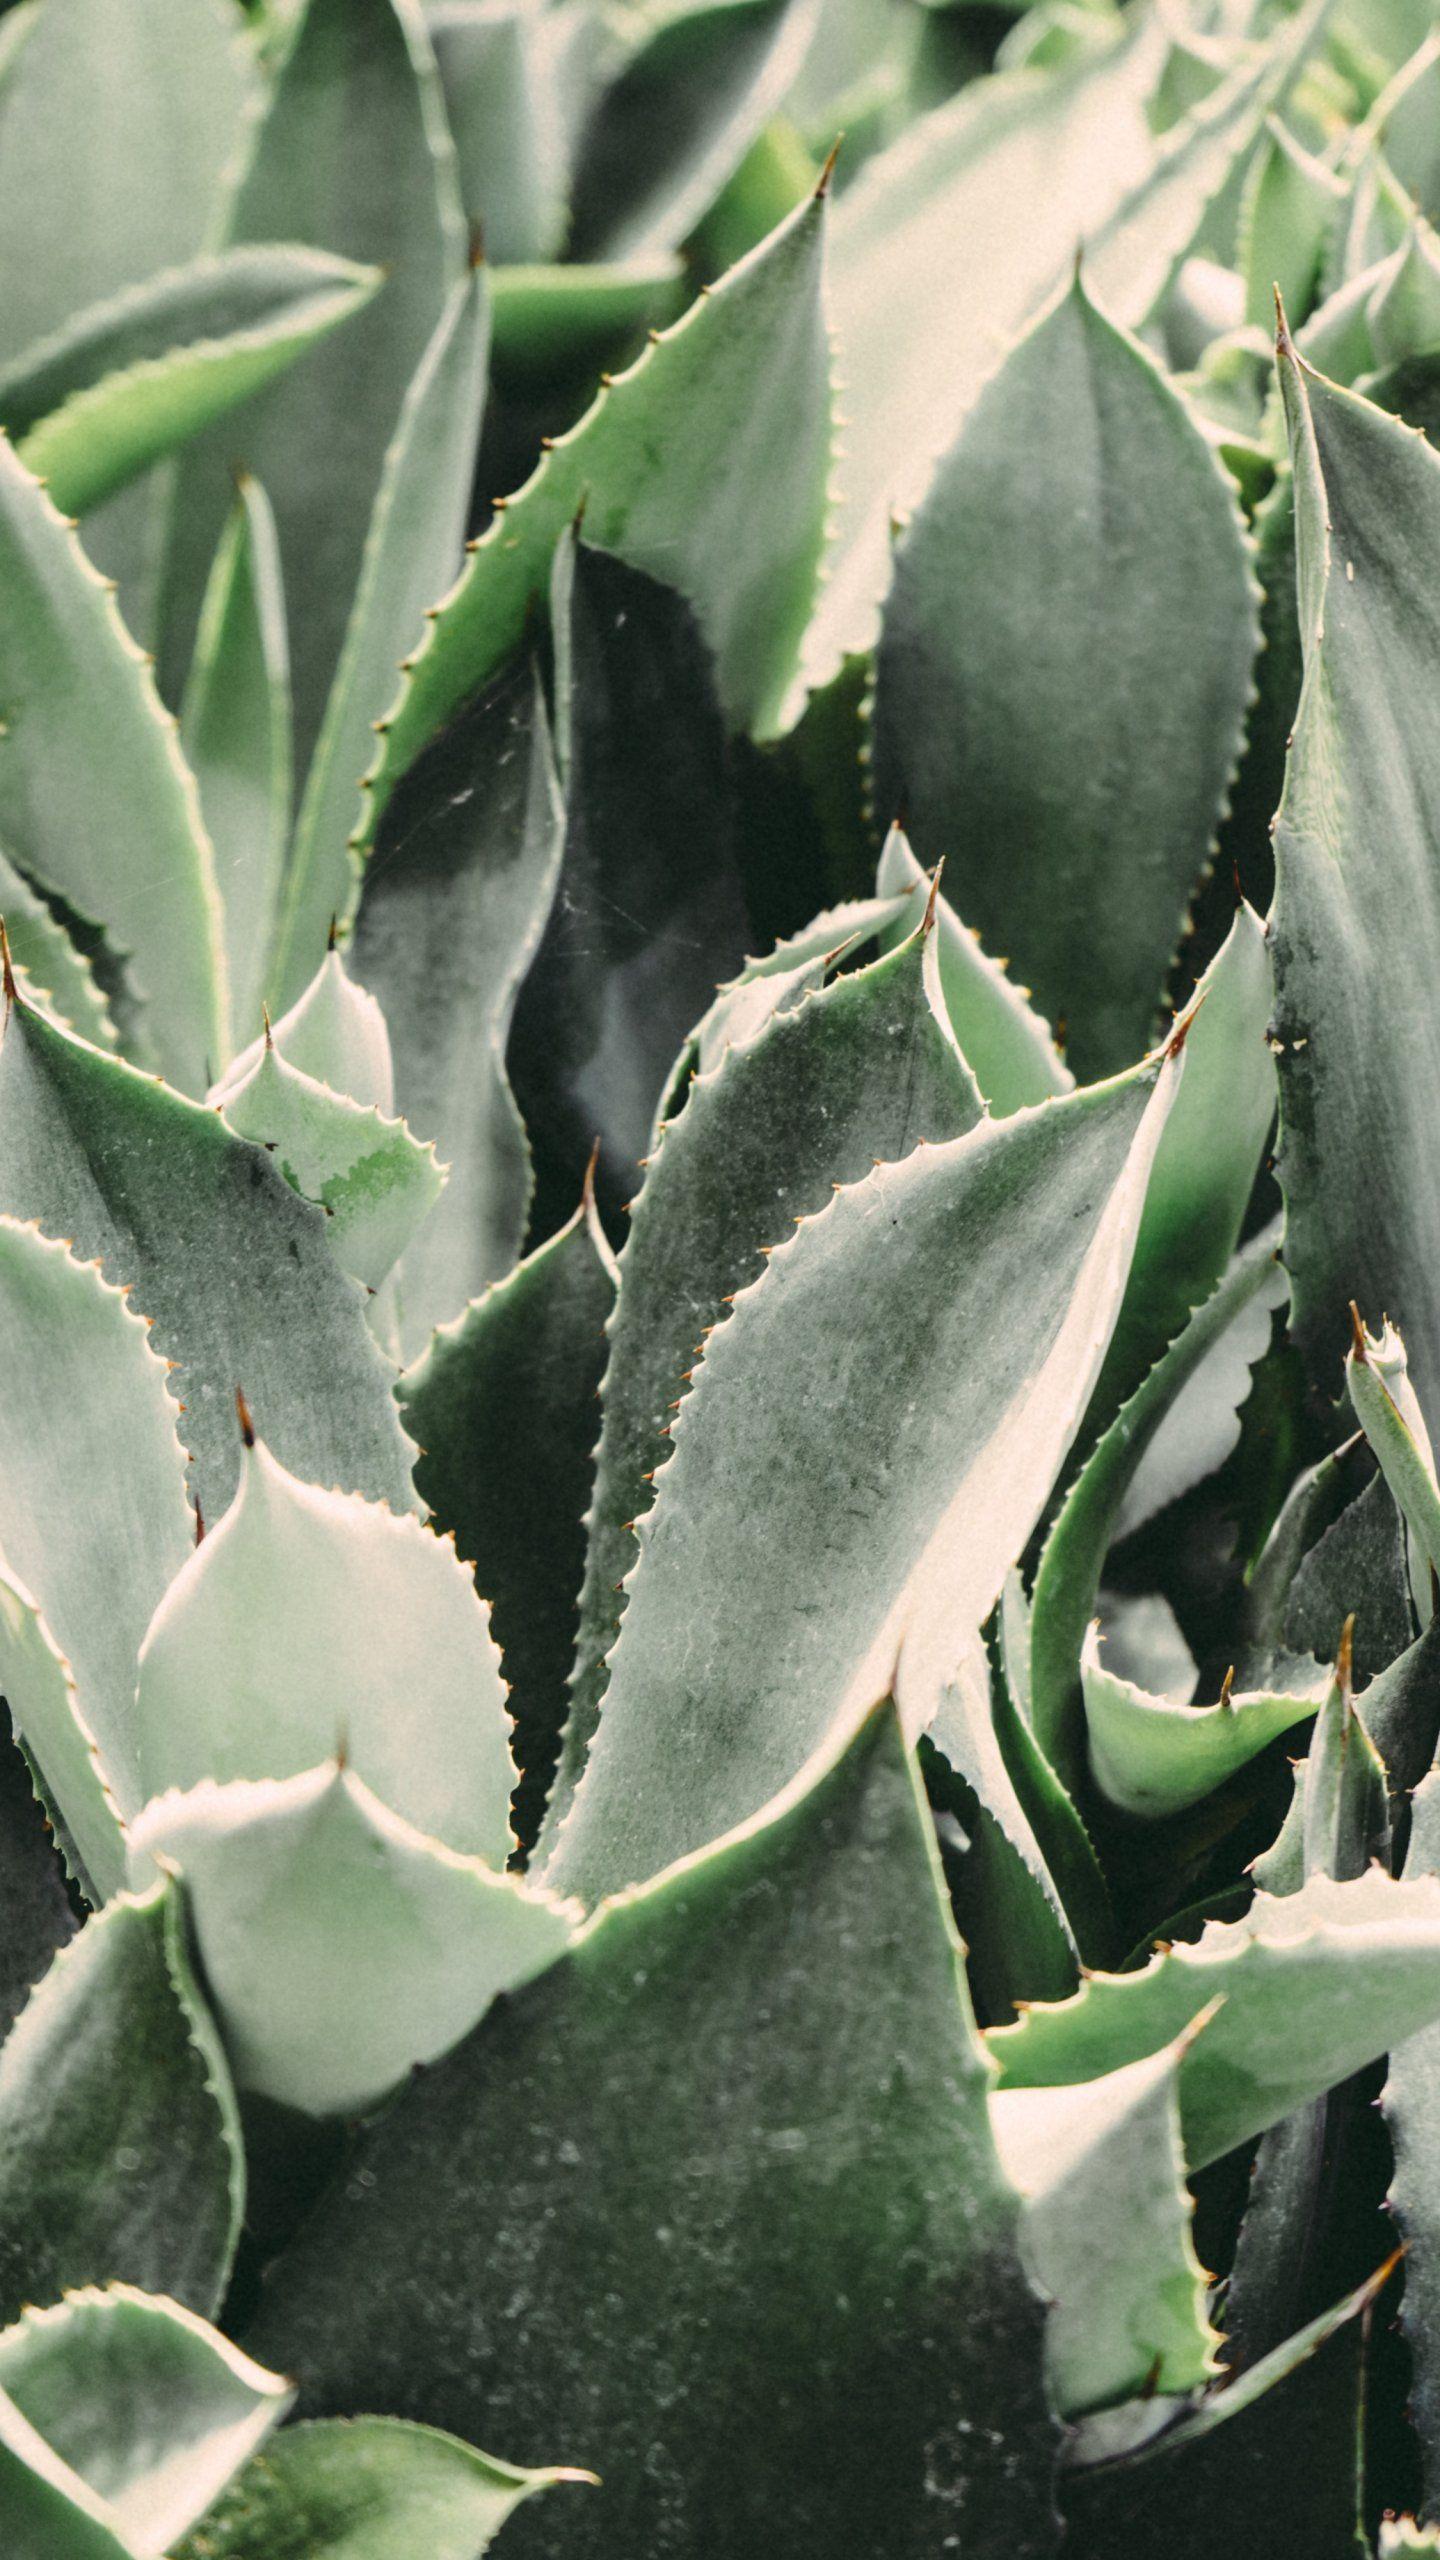 Real Cactus Aesthetic Wallpaper Novocom Top